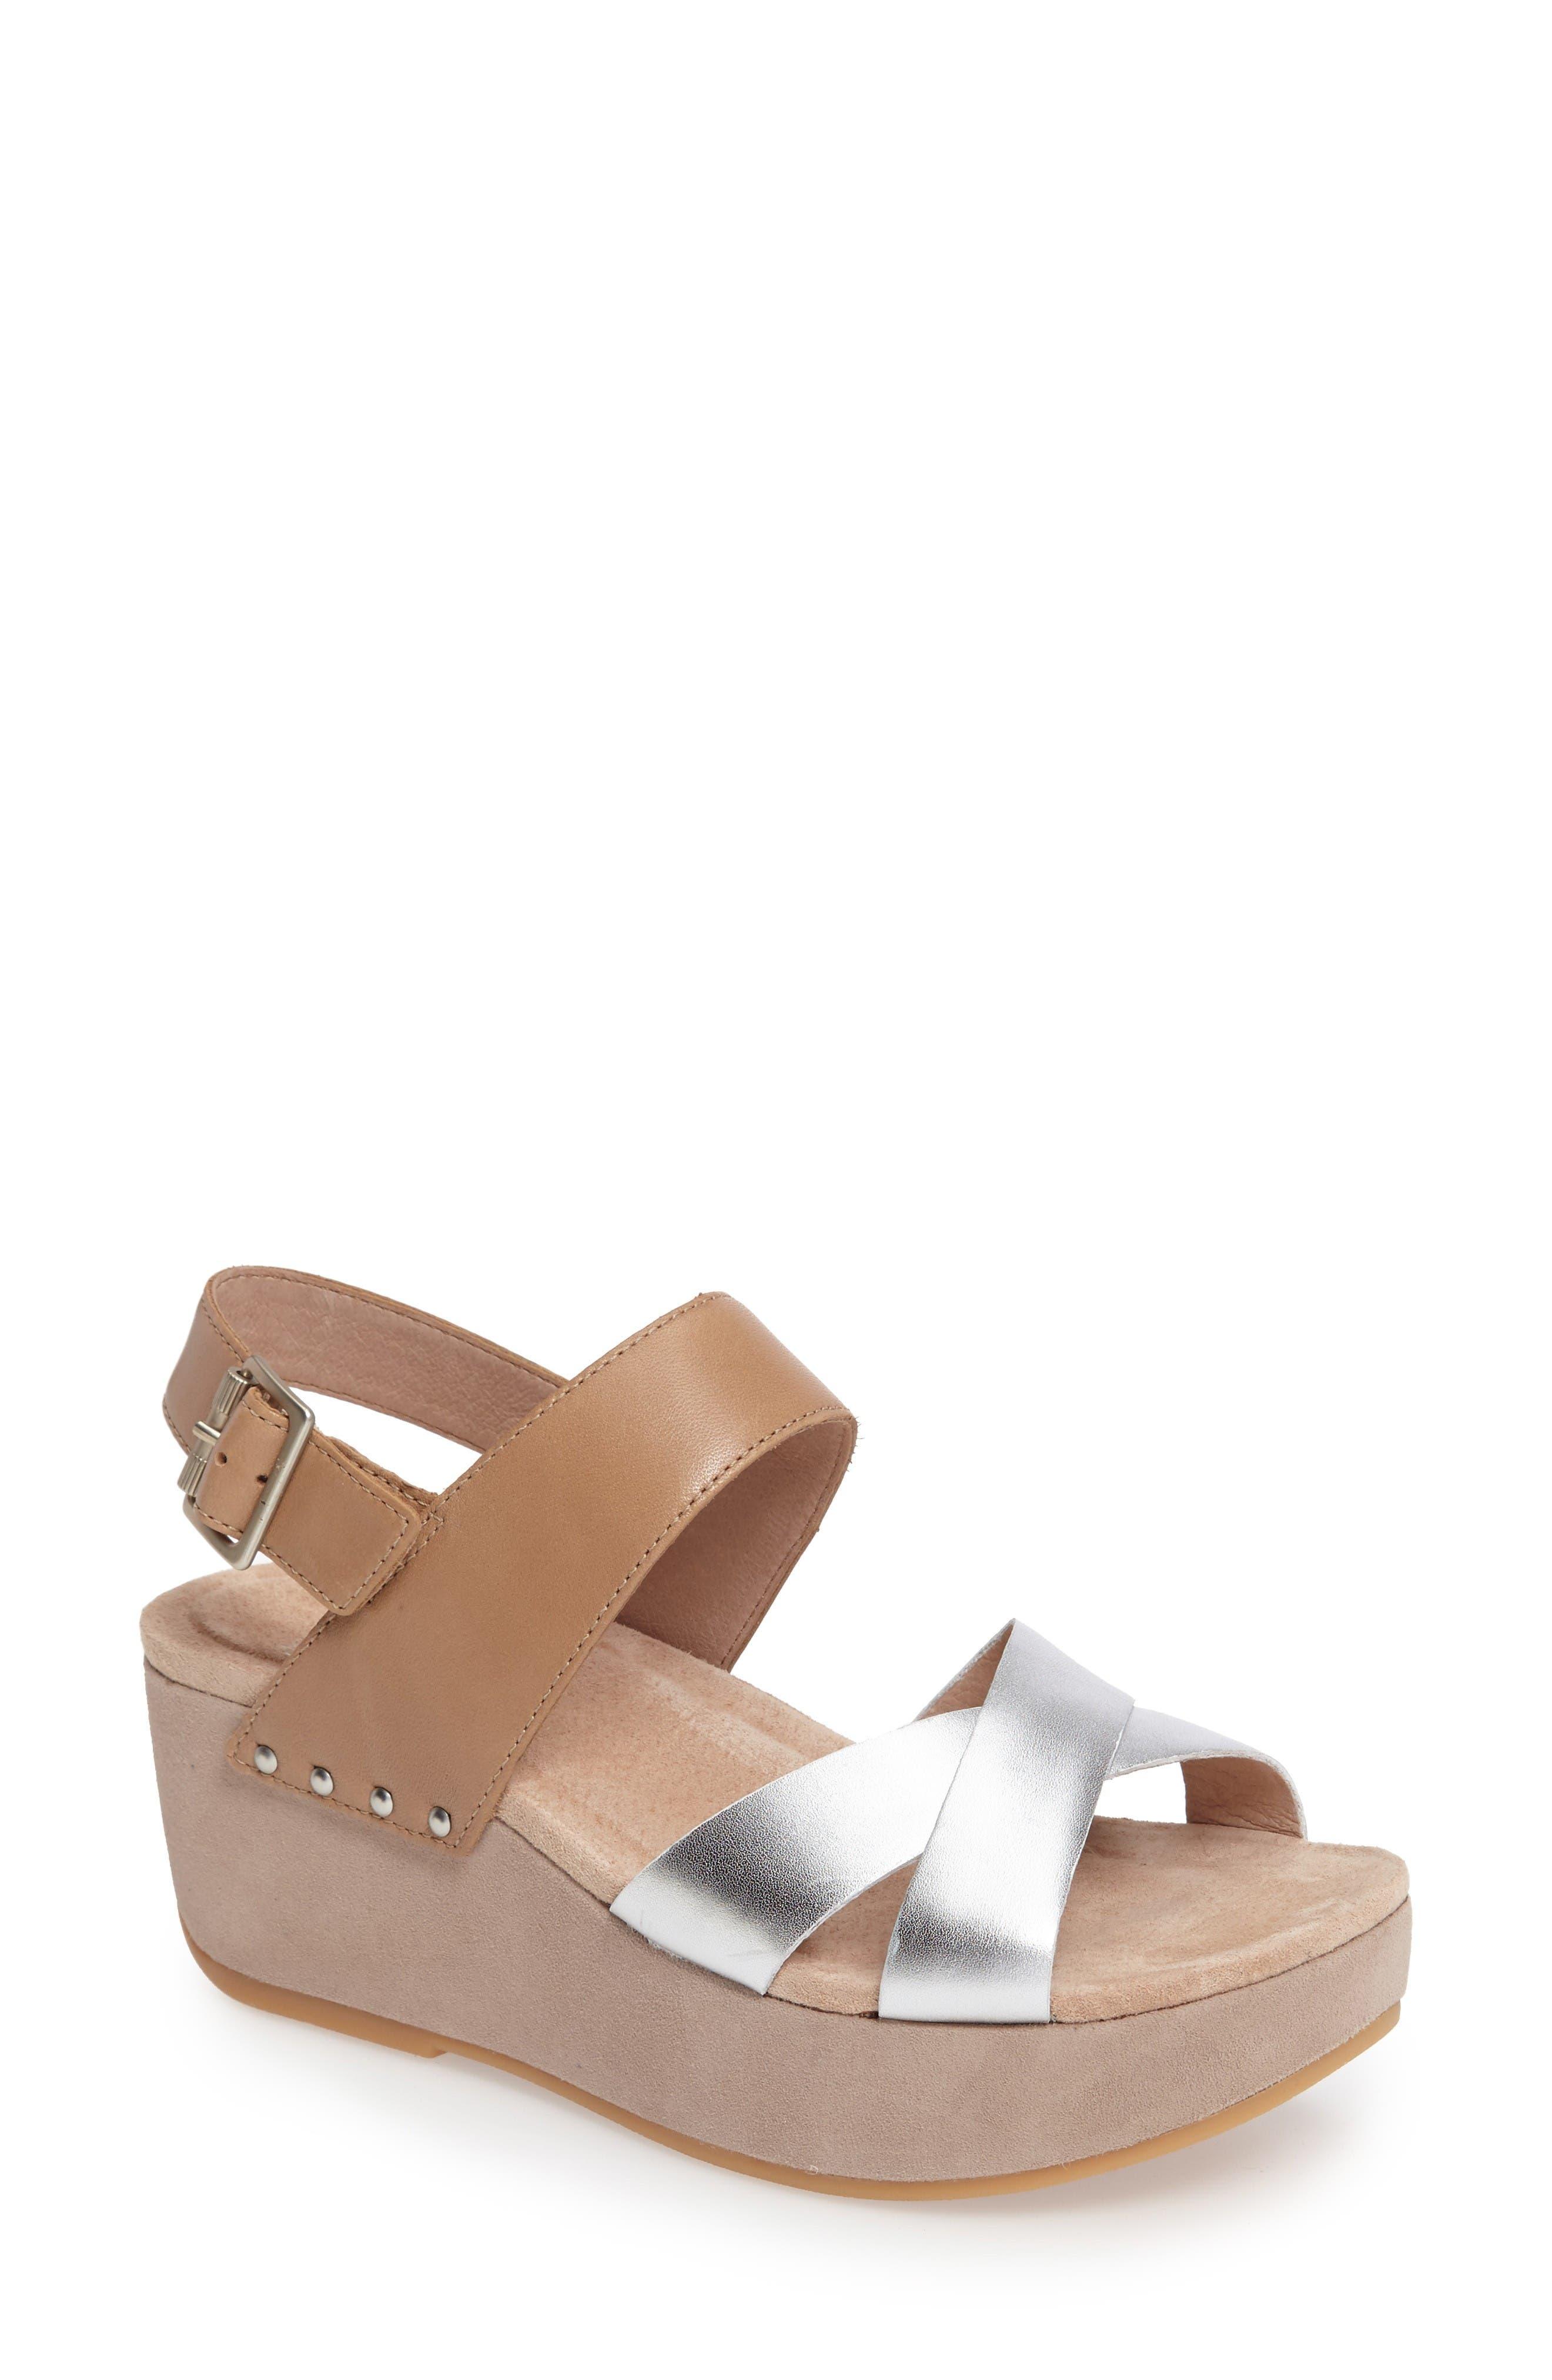 Stasia Platform Wedge Sandal,                             Main thumbnail 1, color,                             Sand/ Silver Leather